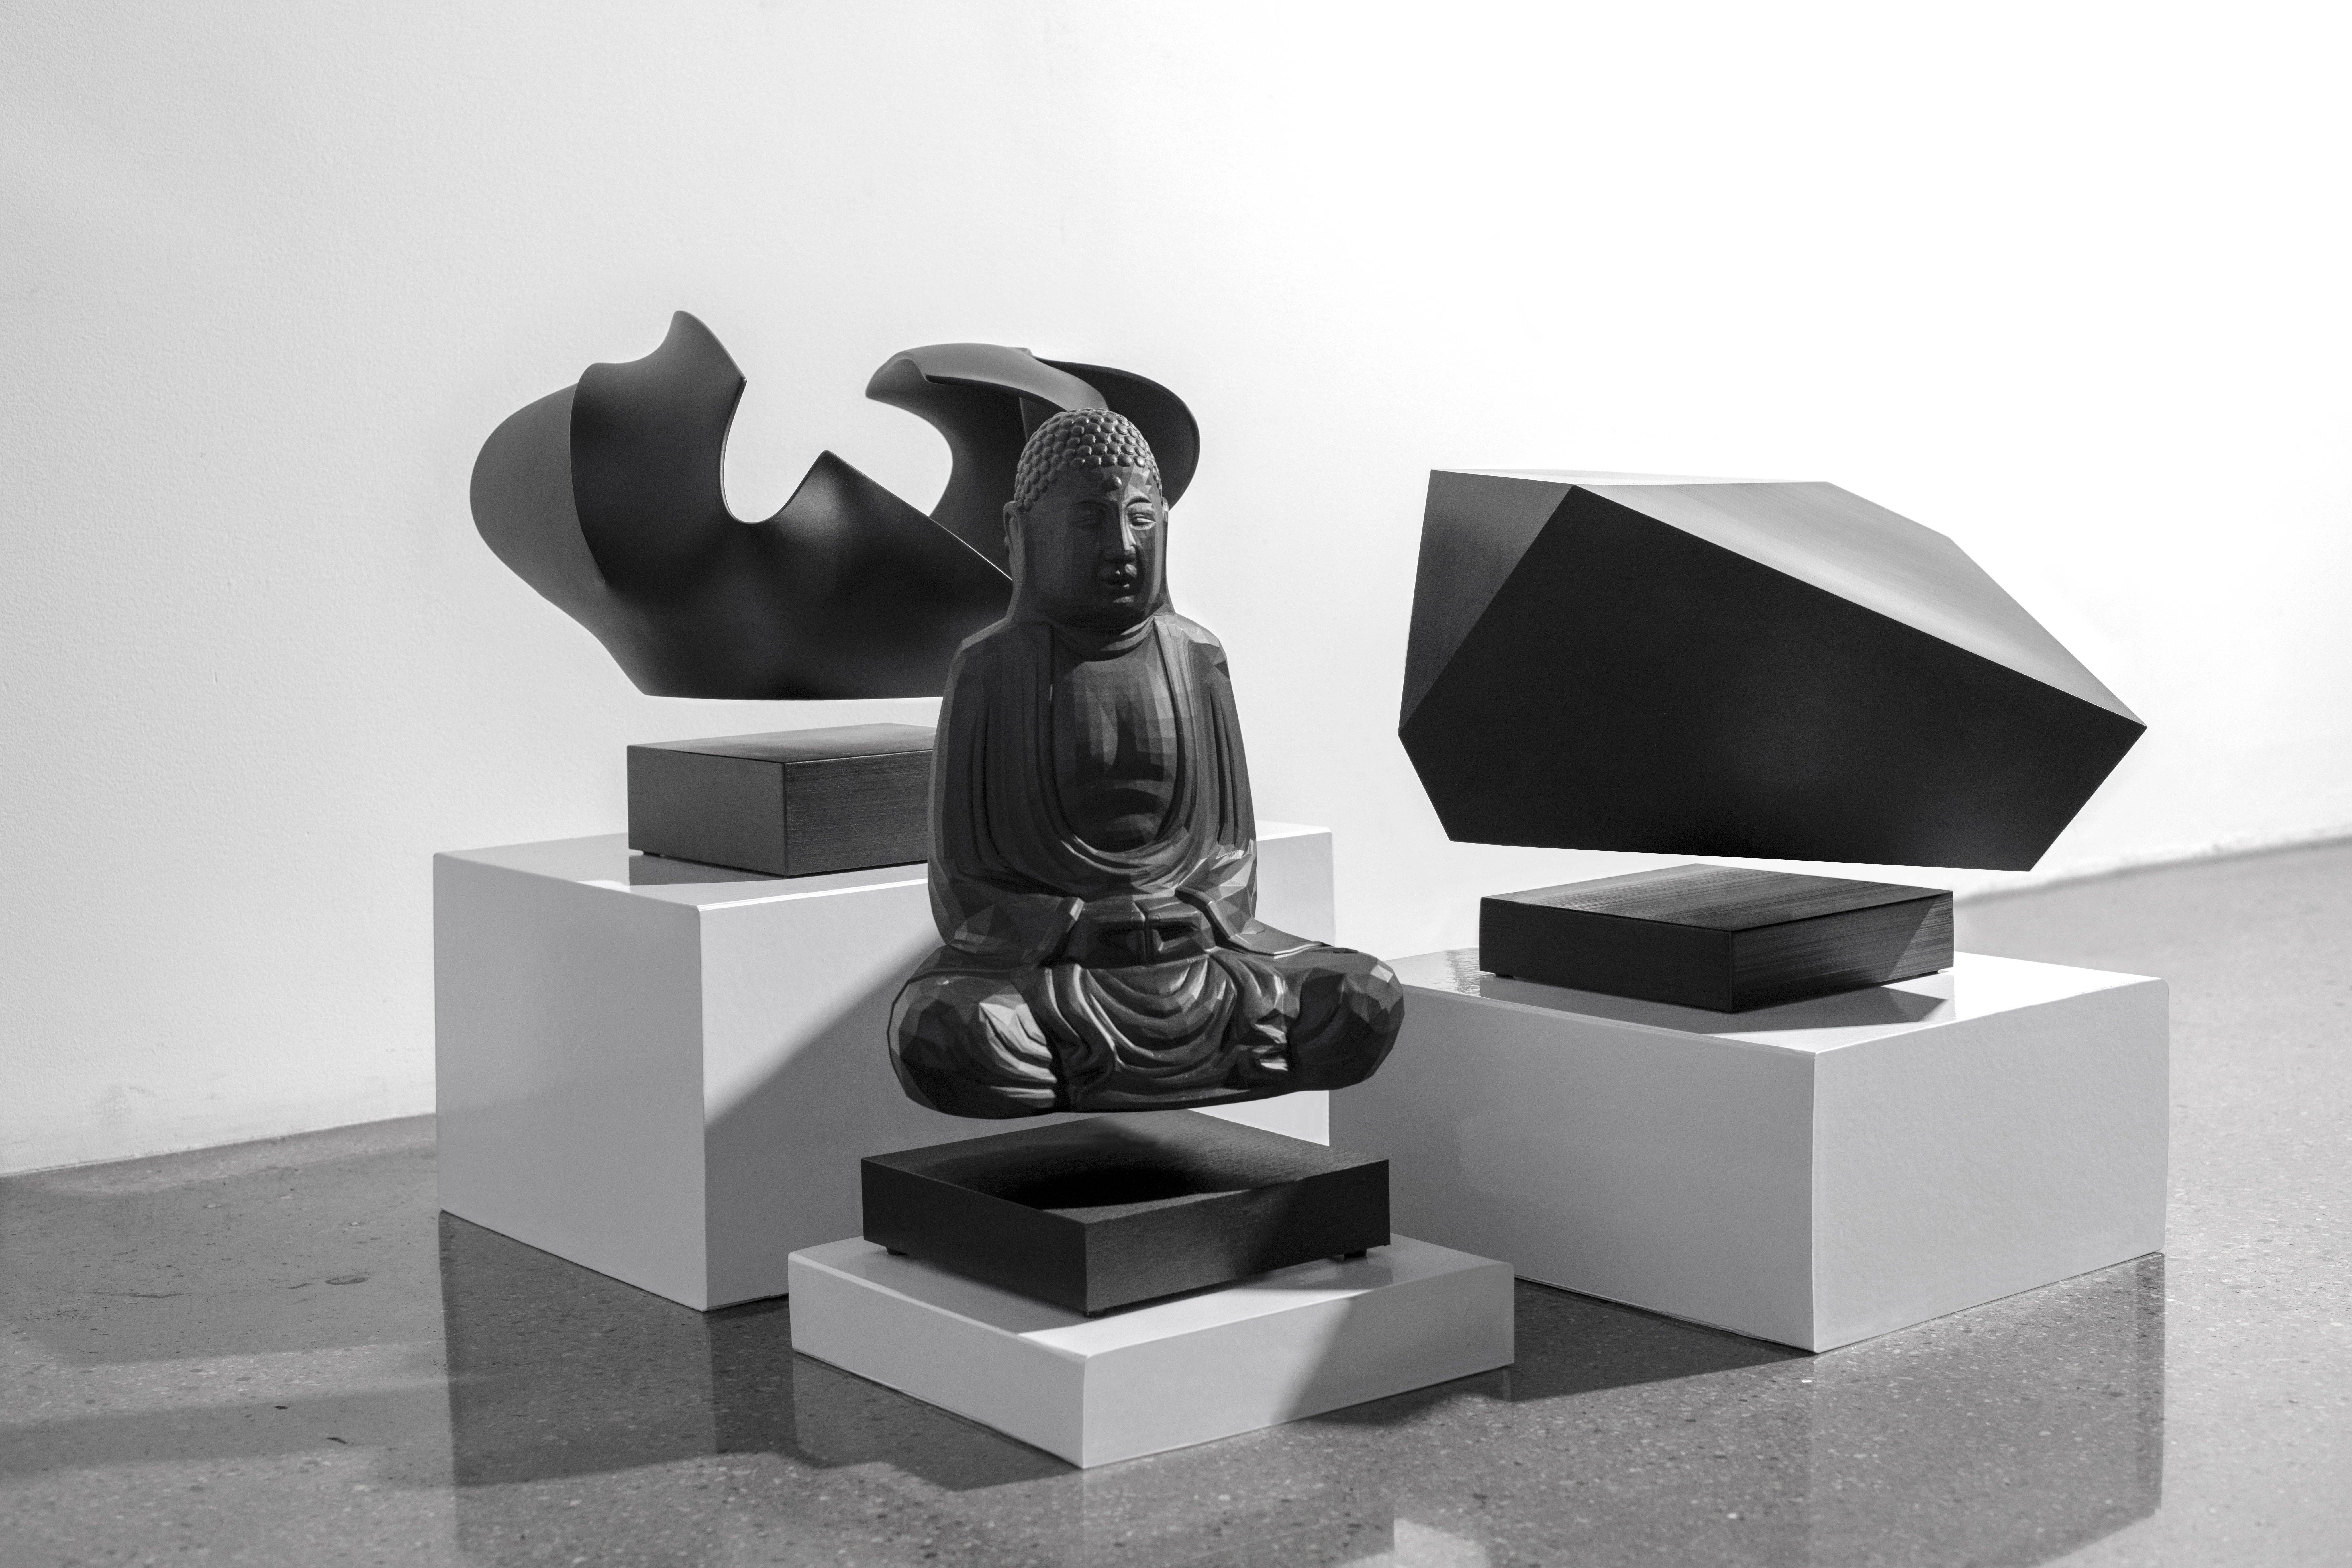 levitating art 758x505 - Are levitating 3D printed objects the next hot art fad?